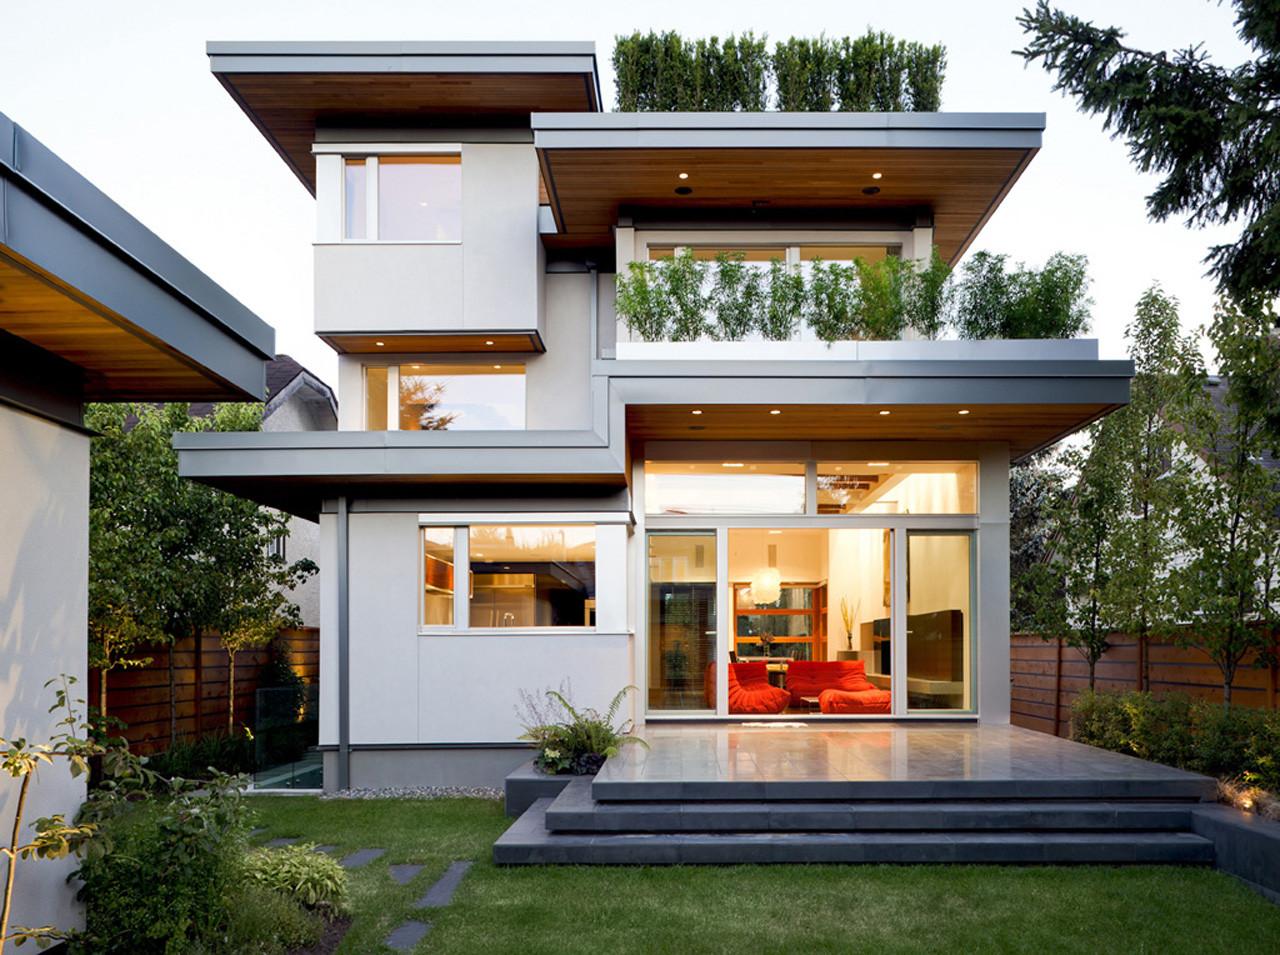 Kerchum Residence / Frits de Vries Architect, © Lucas Finlay